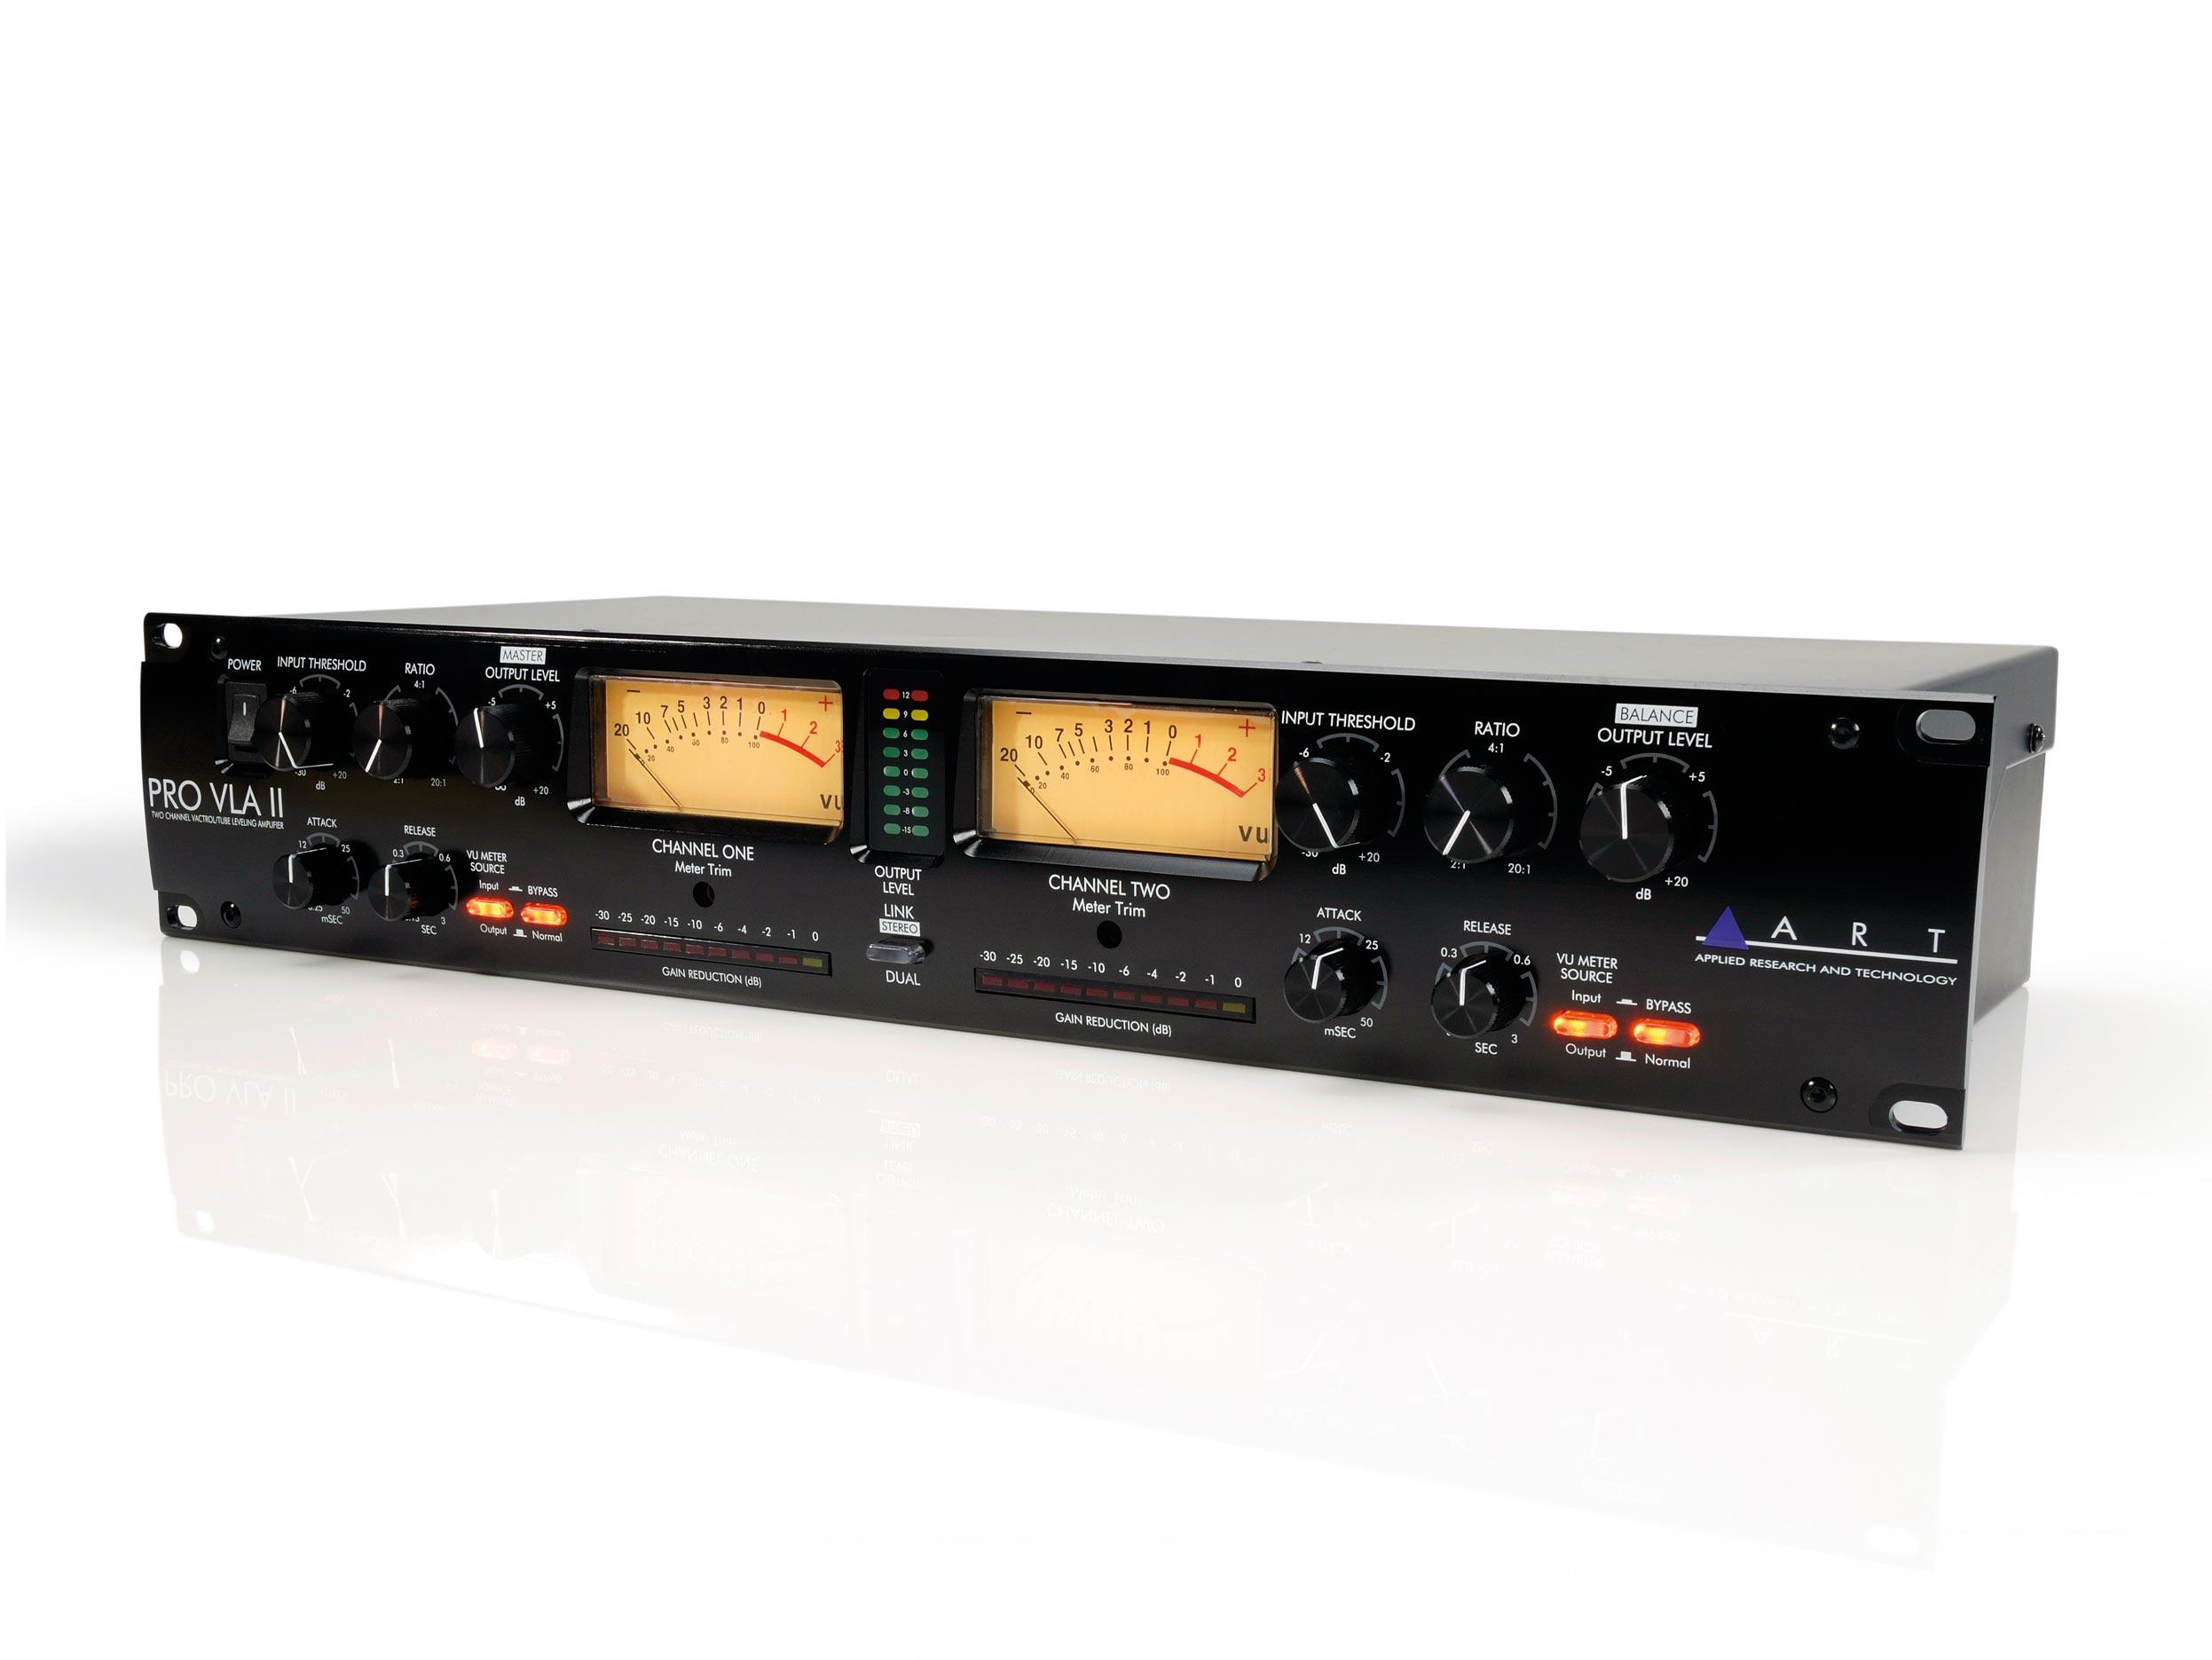 Art Provla Ii Review Musicradar Audio Level Balance And Tone Control Circuits Electronics Tutorial